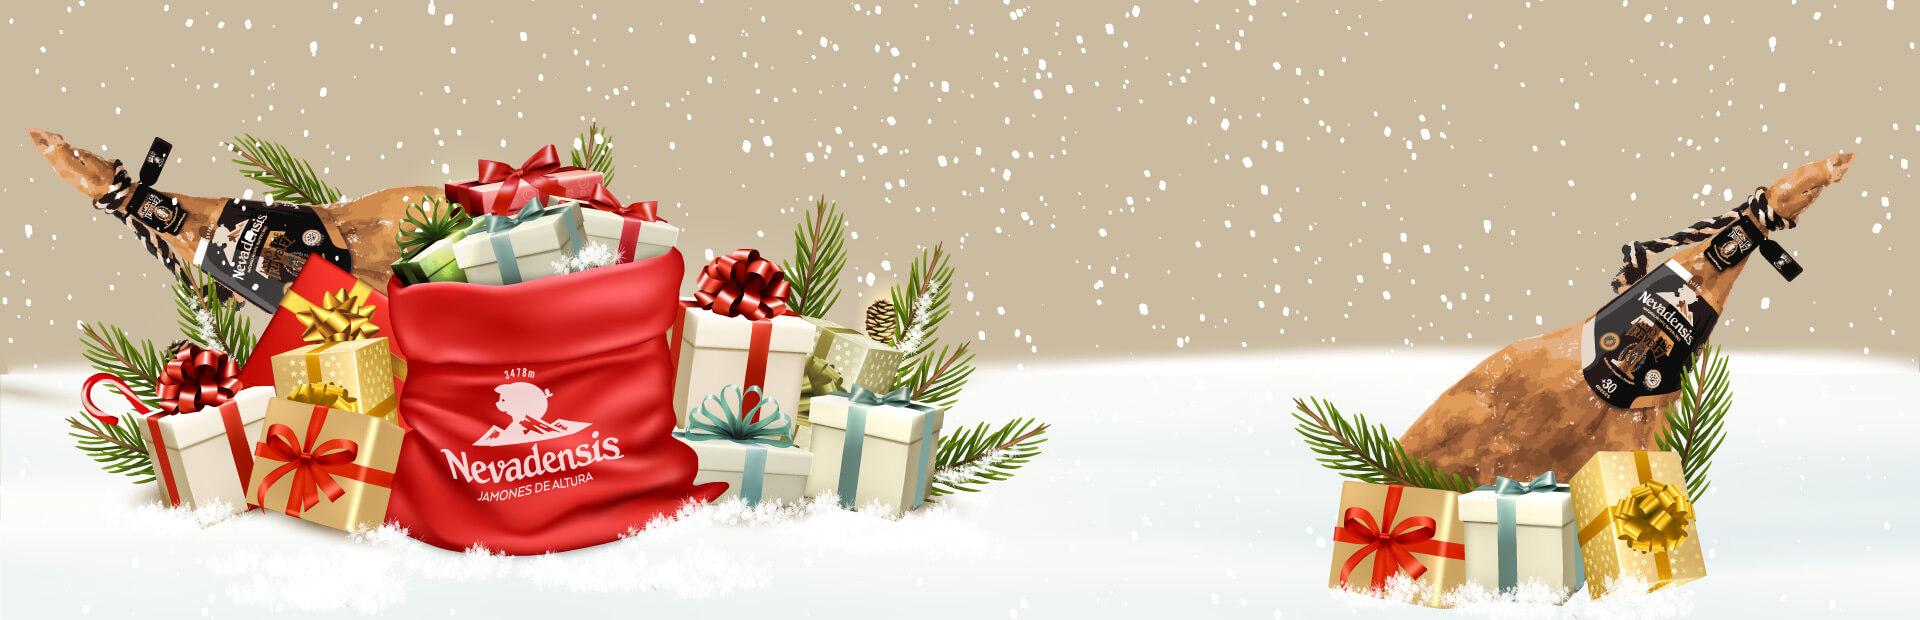 Navidades Nevadensis...